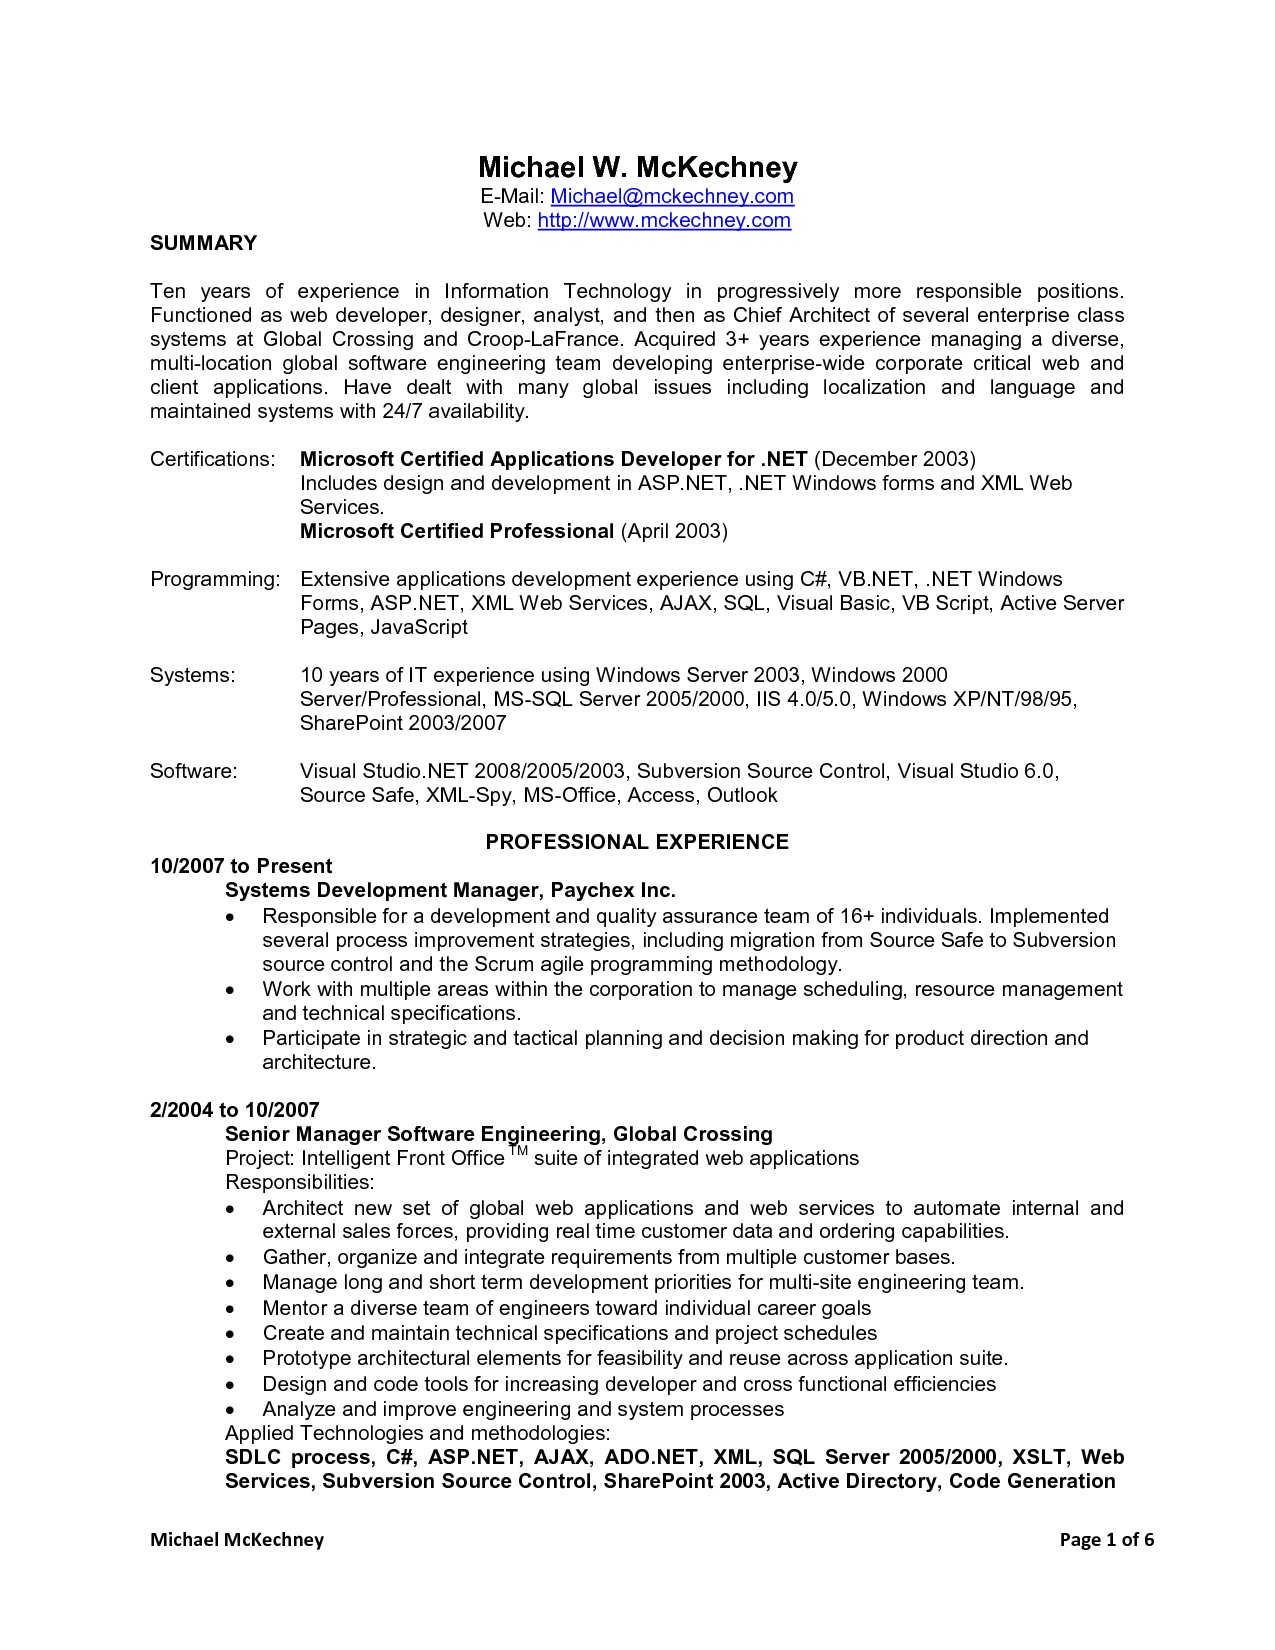 java 4 years experience resume